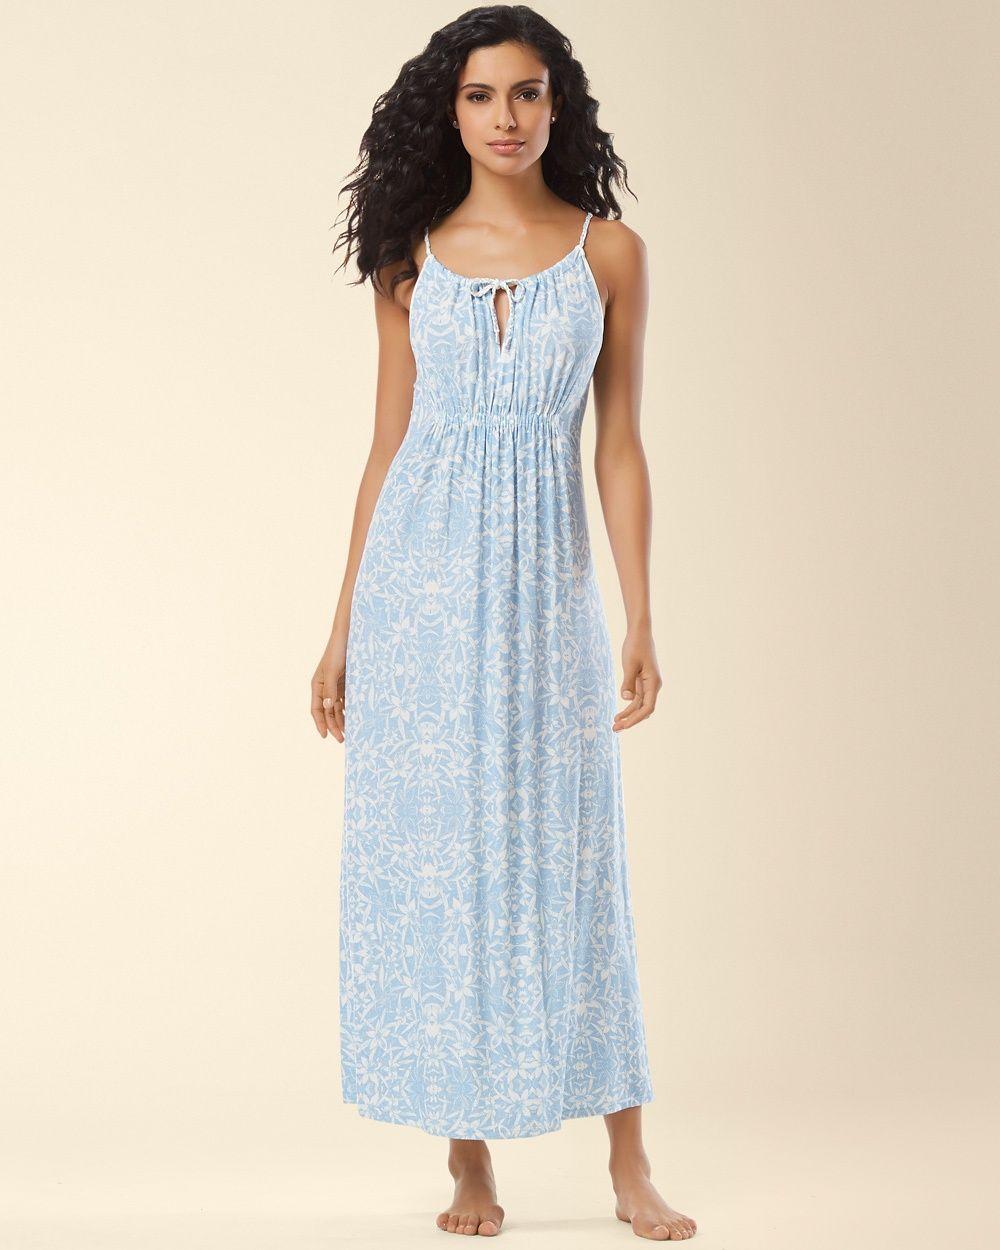 Midnight by Carole Hochman Night Gown in Island Life Blue Print. Let ...